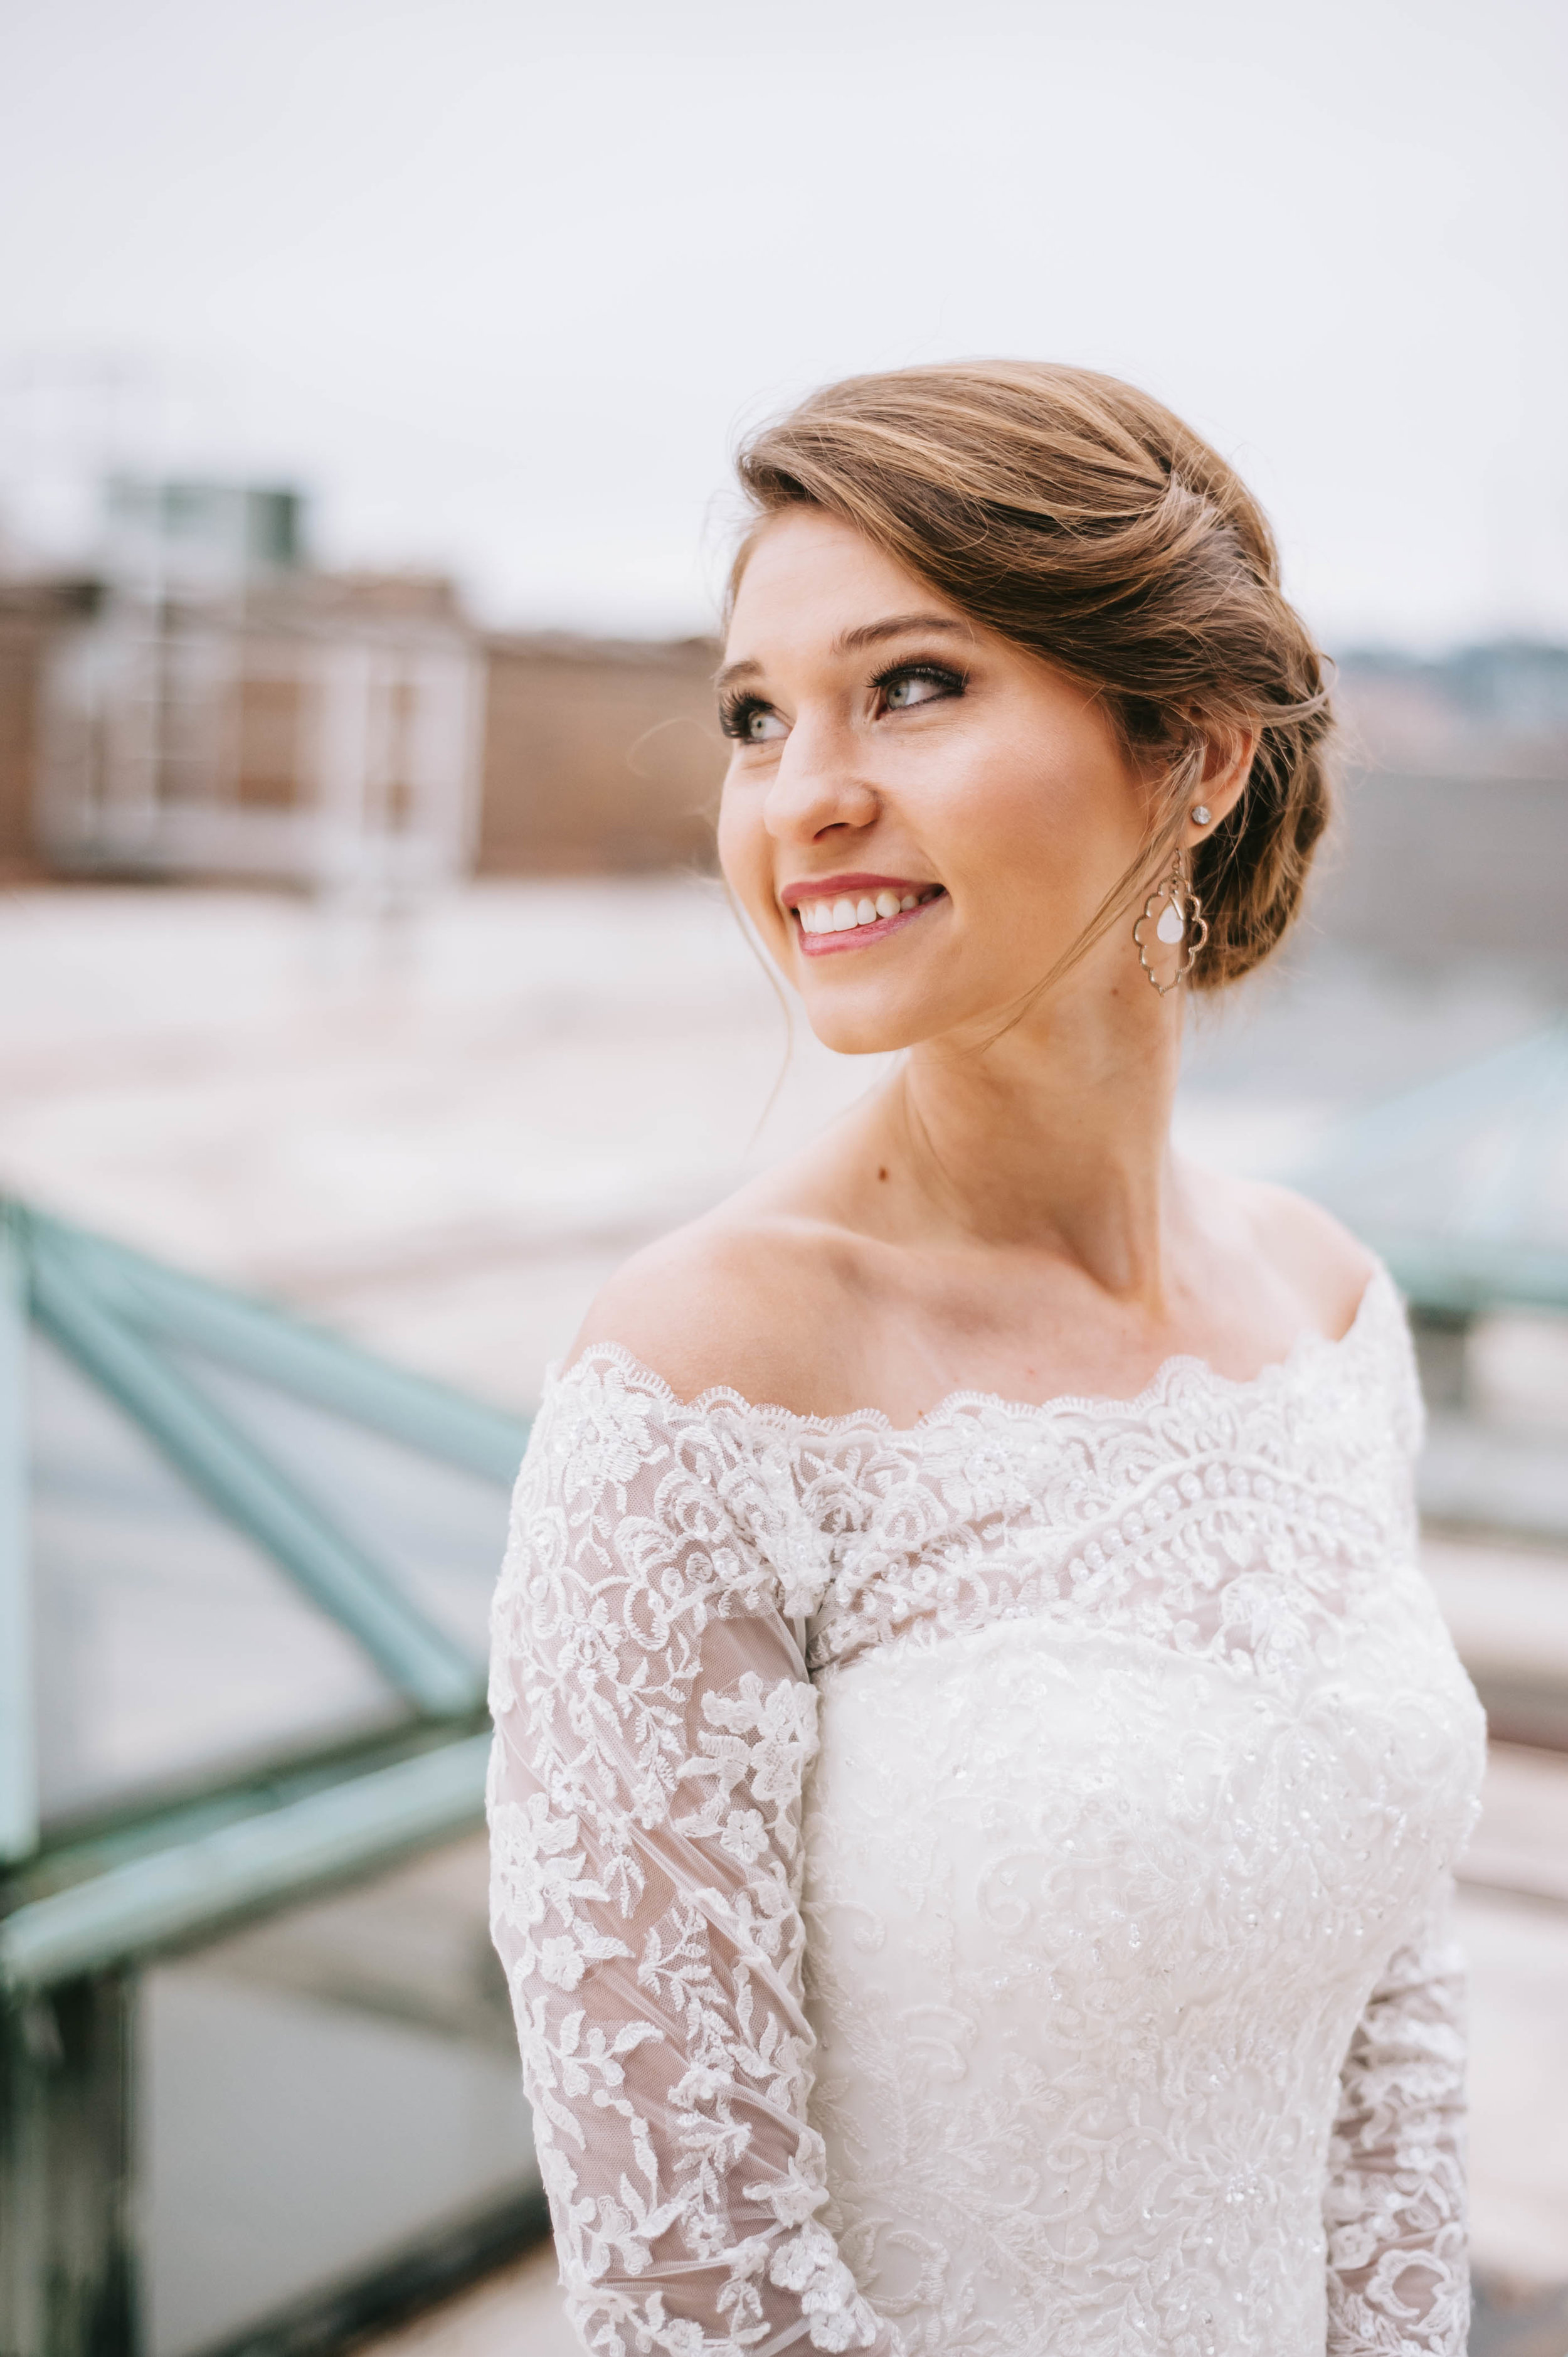 Hannah Steward Baskin | Bridals (53 of 74).jpg